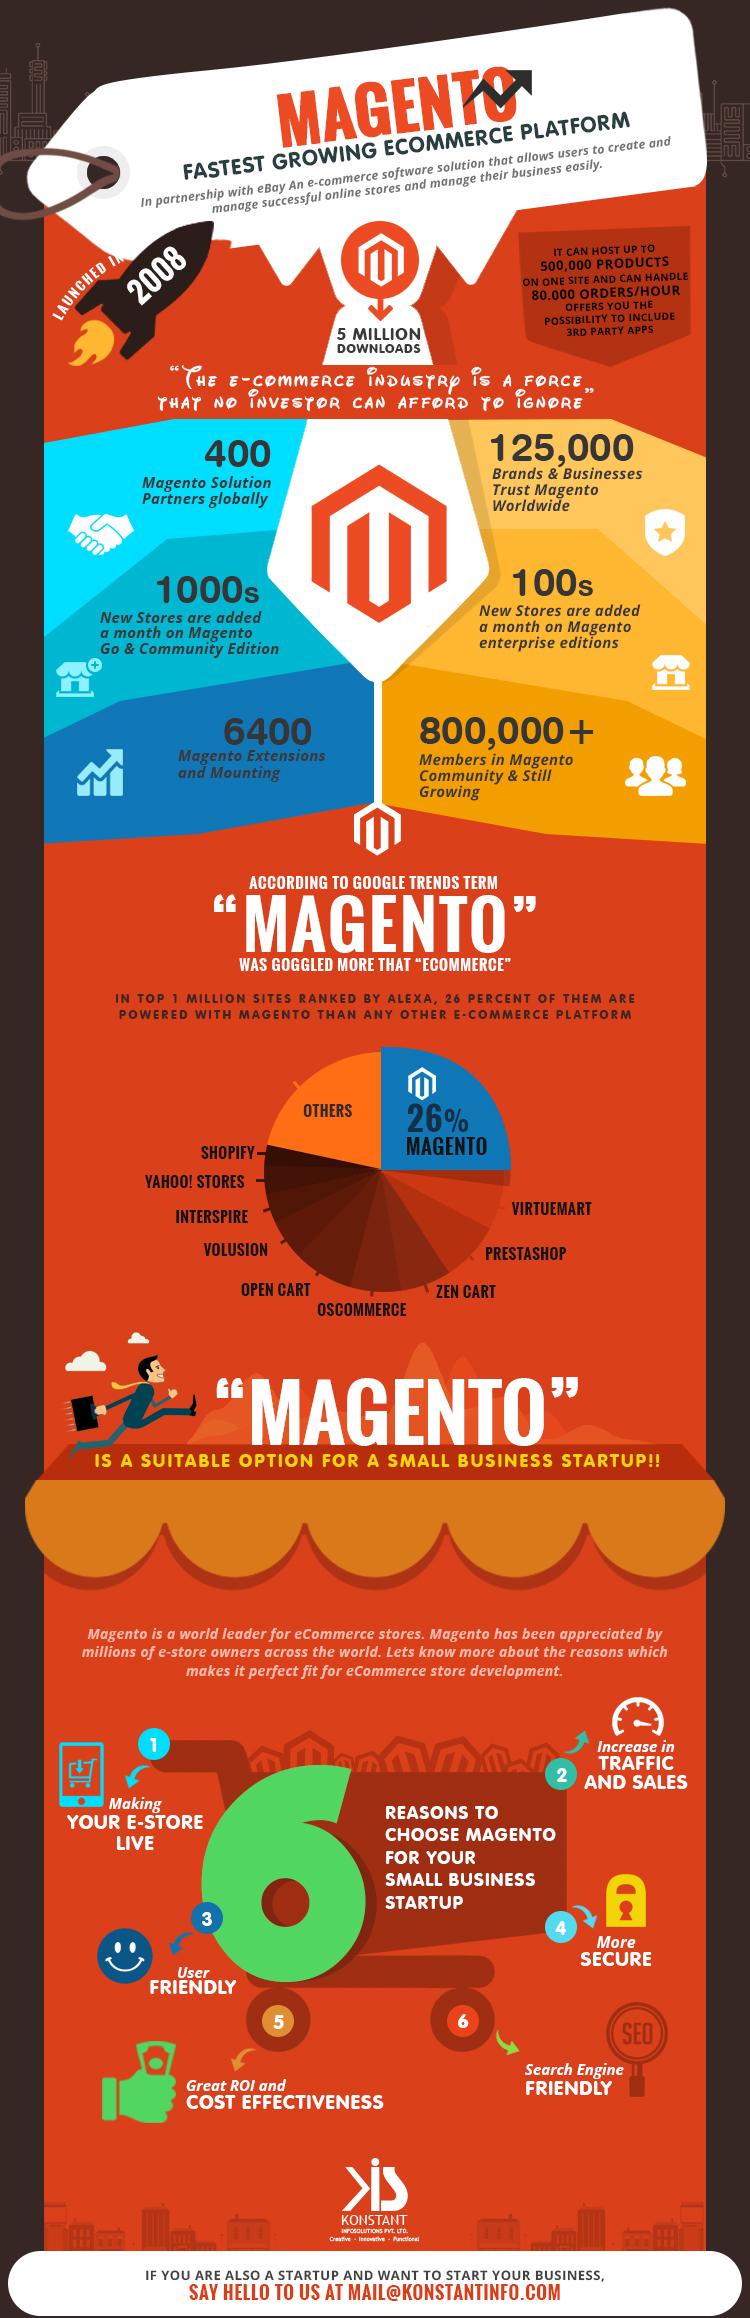 Magento – Fastest Growing eCommerce Platform